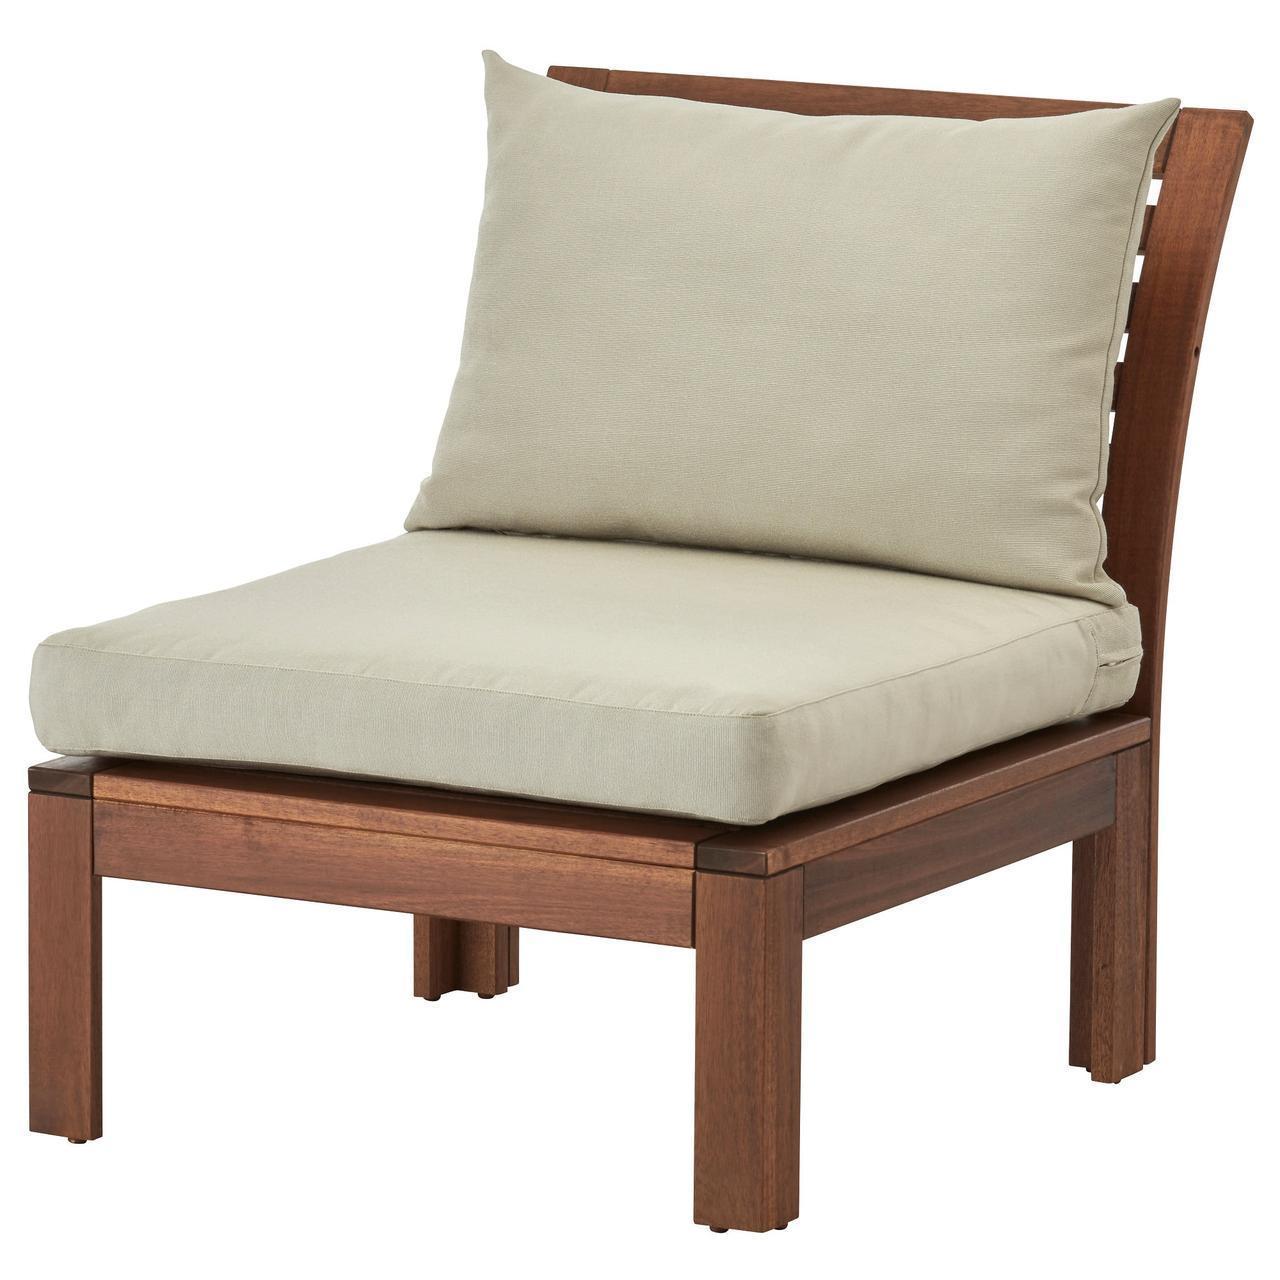 IKEA APPLARO Садове крісло, коричнева морилка бежевий Холло бежевий (390.483.84)